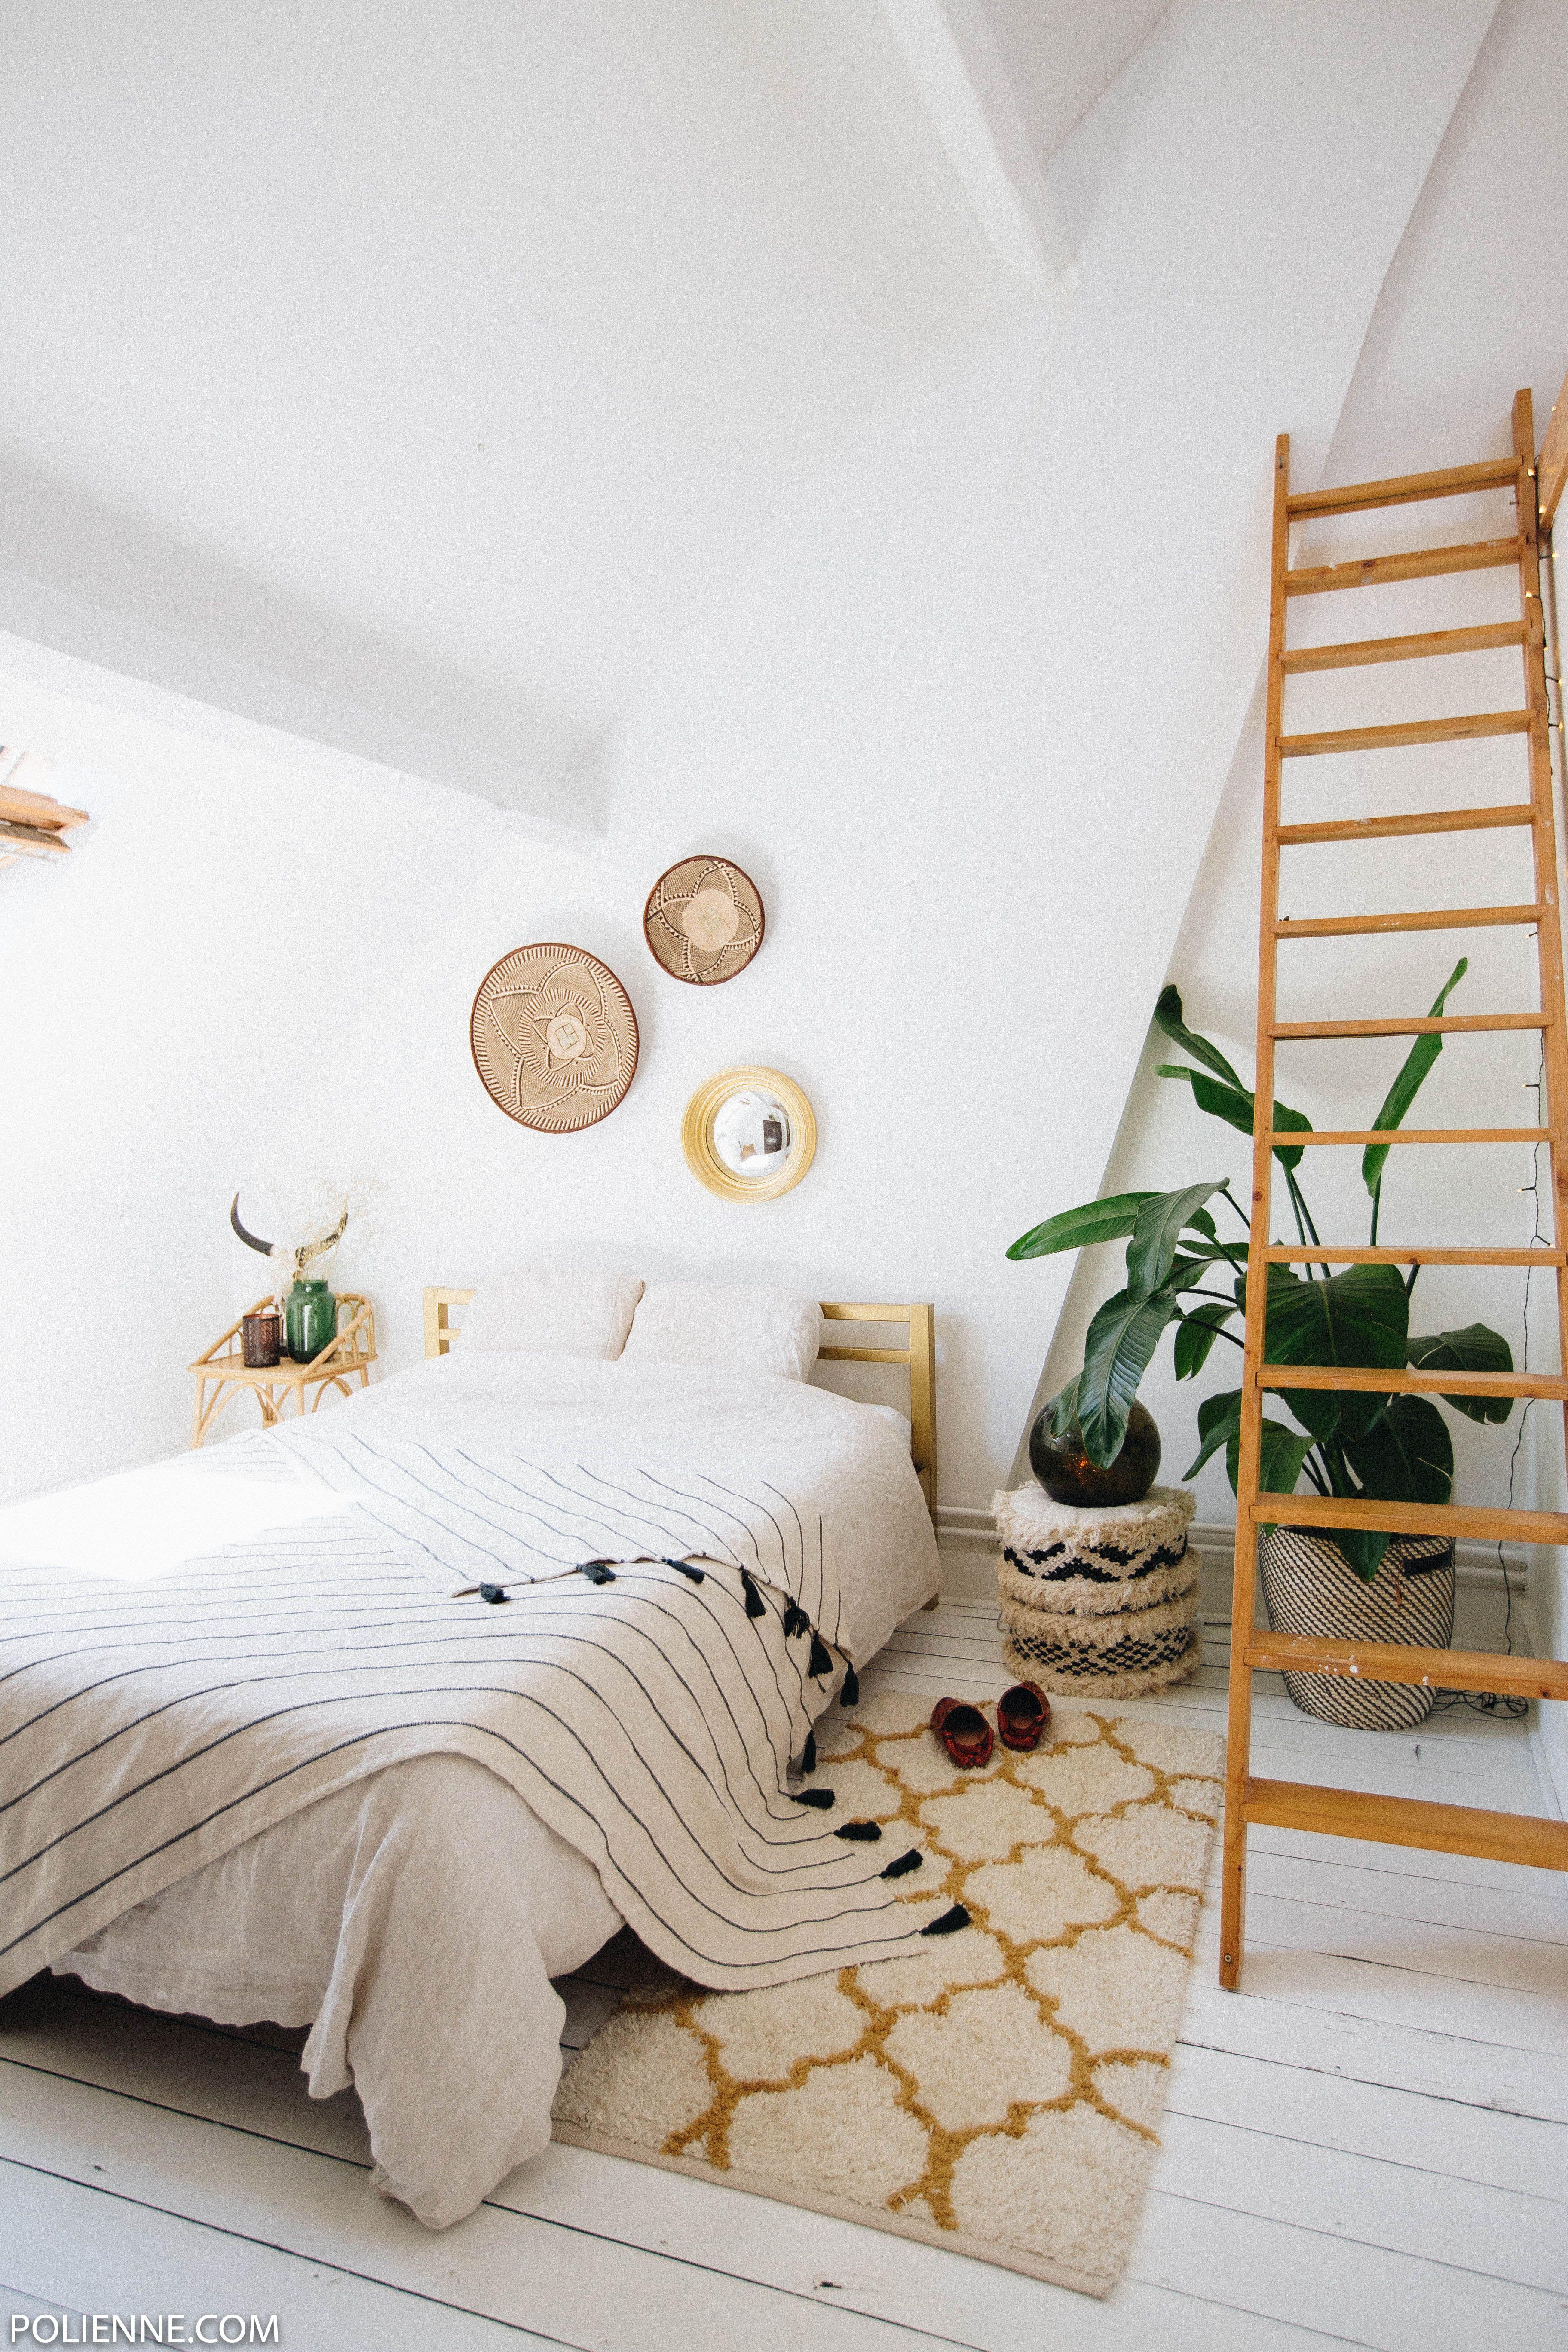 Our Boho Bedroom Make Over Before & After  Polienne